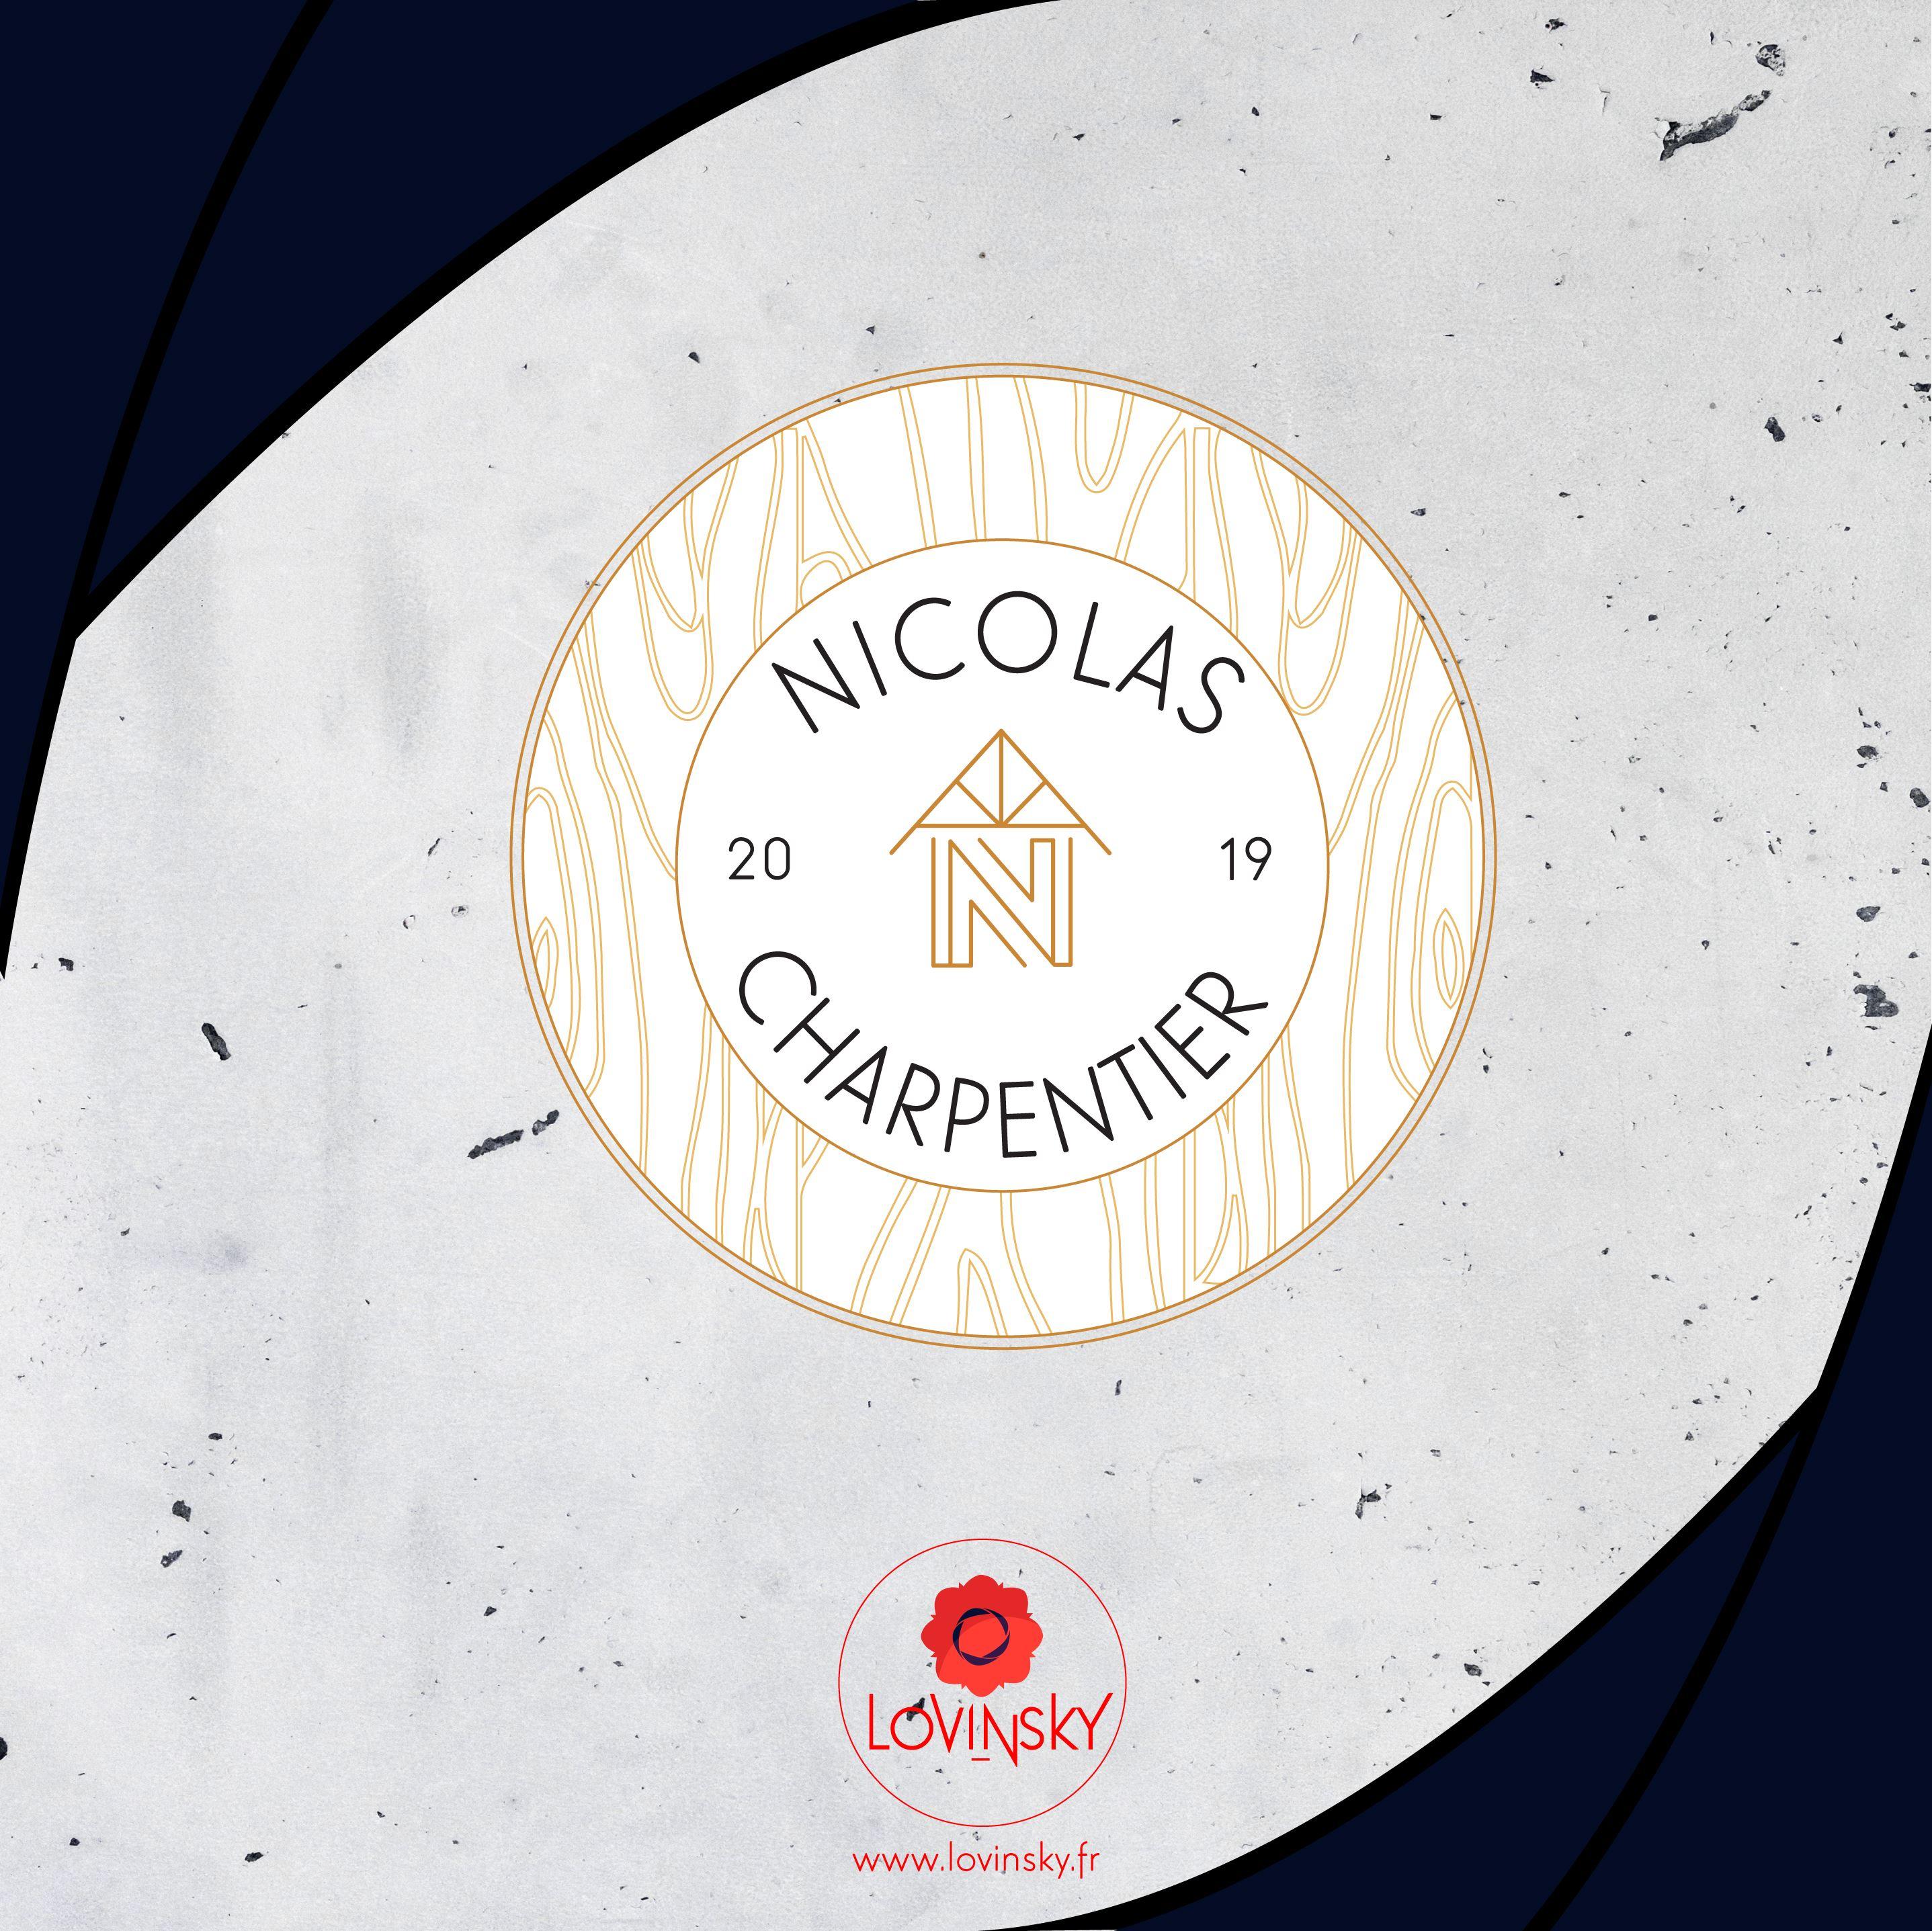 nicolas-charpentier logo lovinsky graphiste webdesigner freelance nantes 44